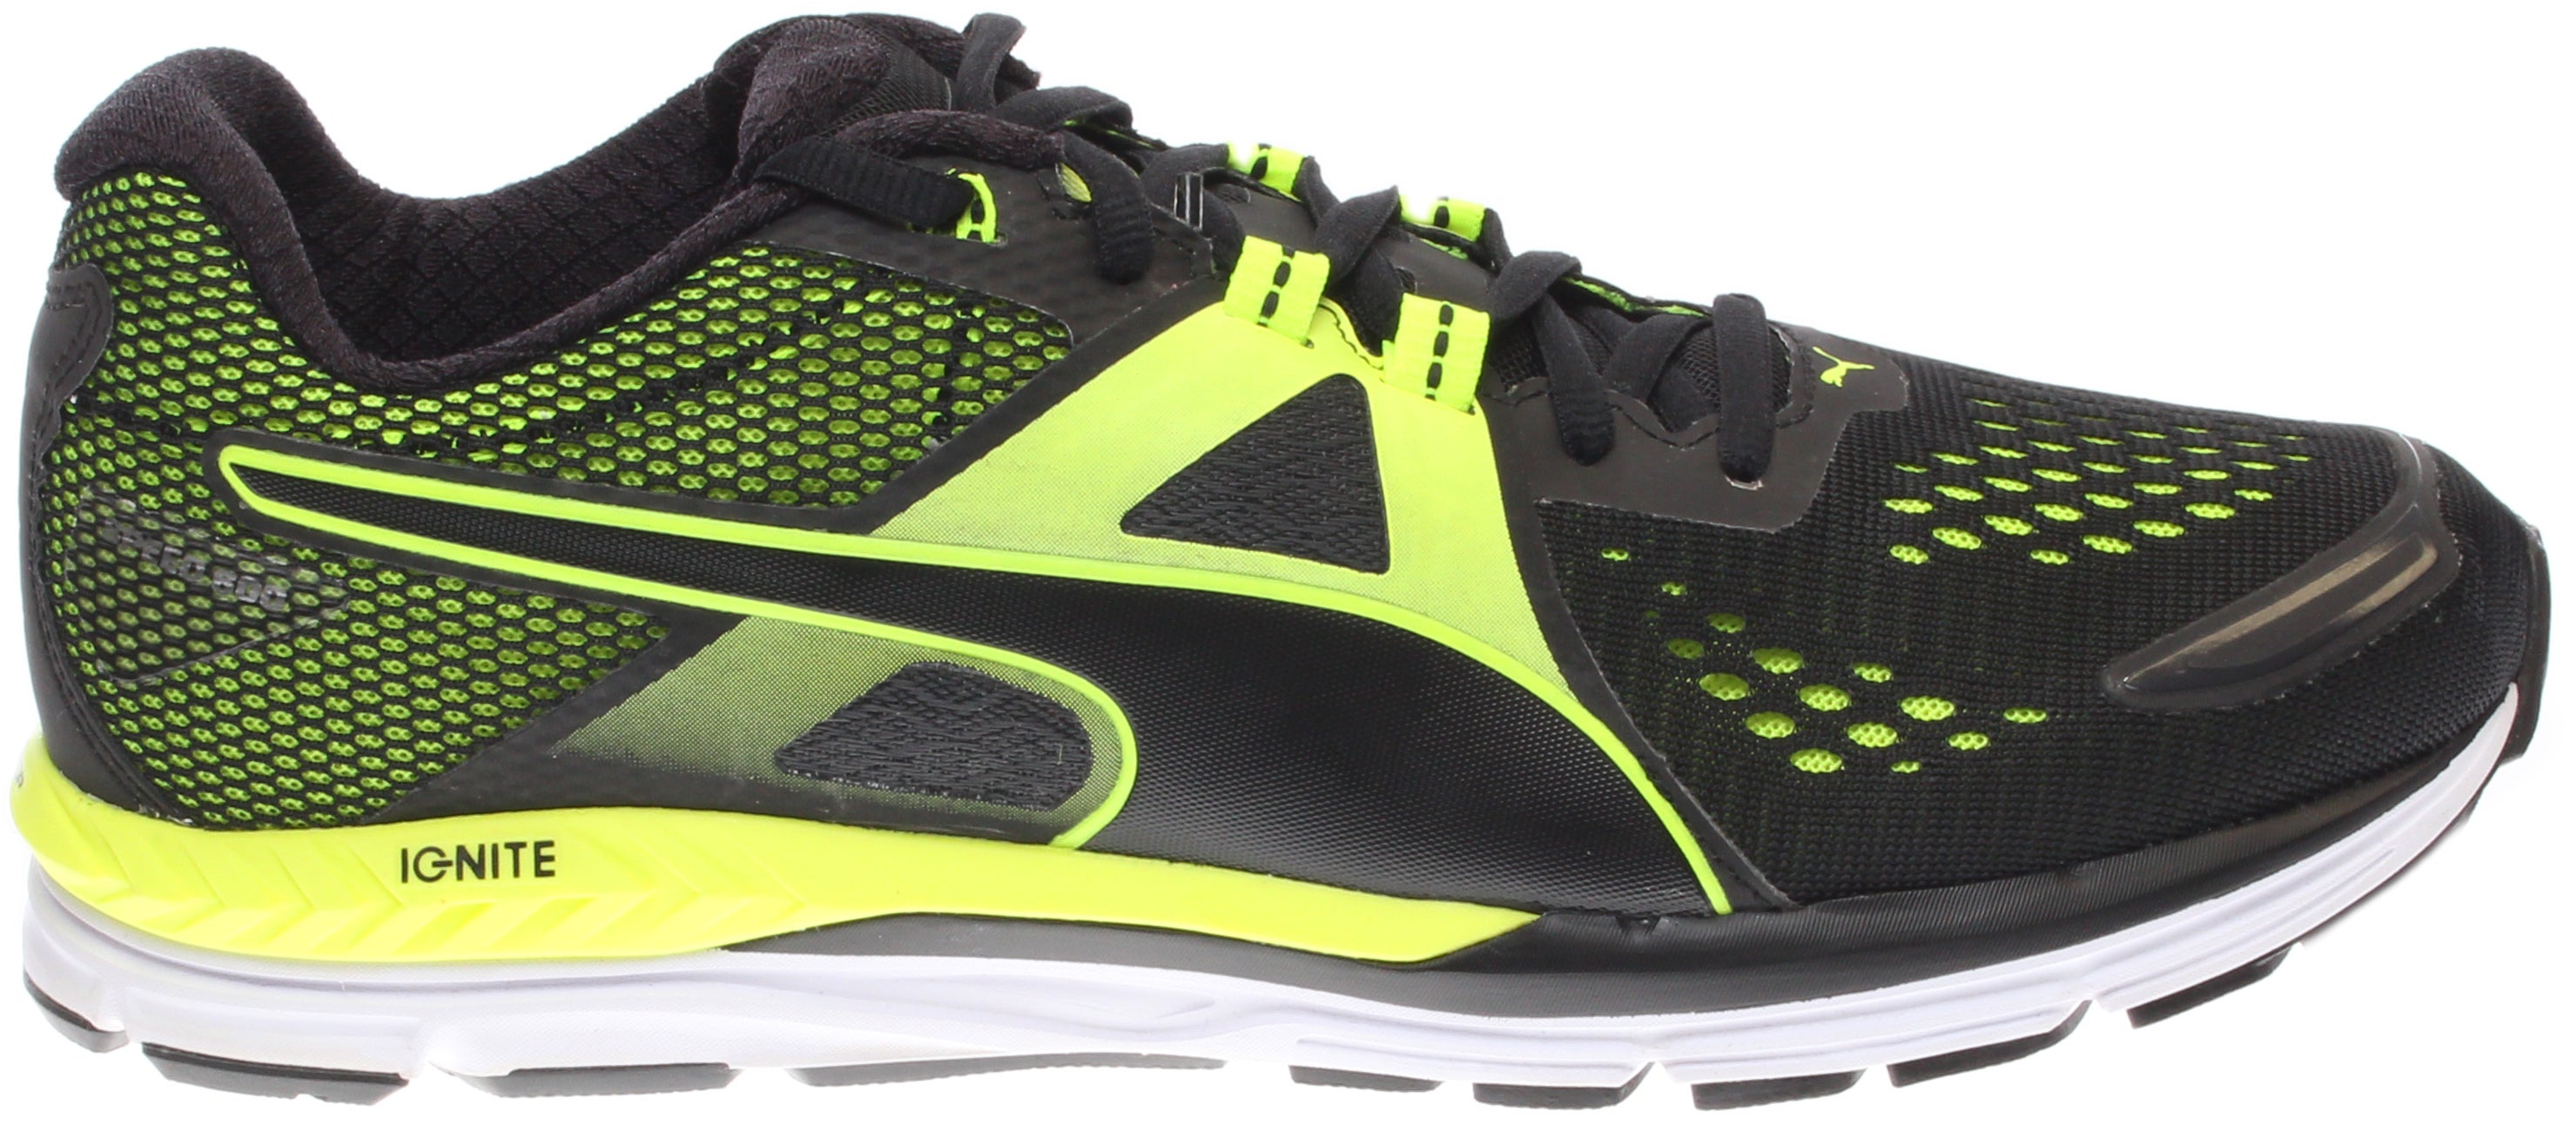 Puma Speed 600 IGNITE Men's Running Shoes Black - Mens  - Size 8